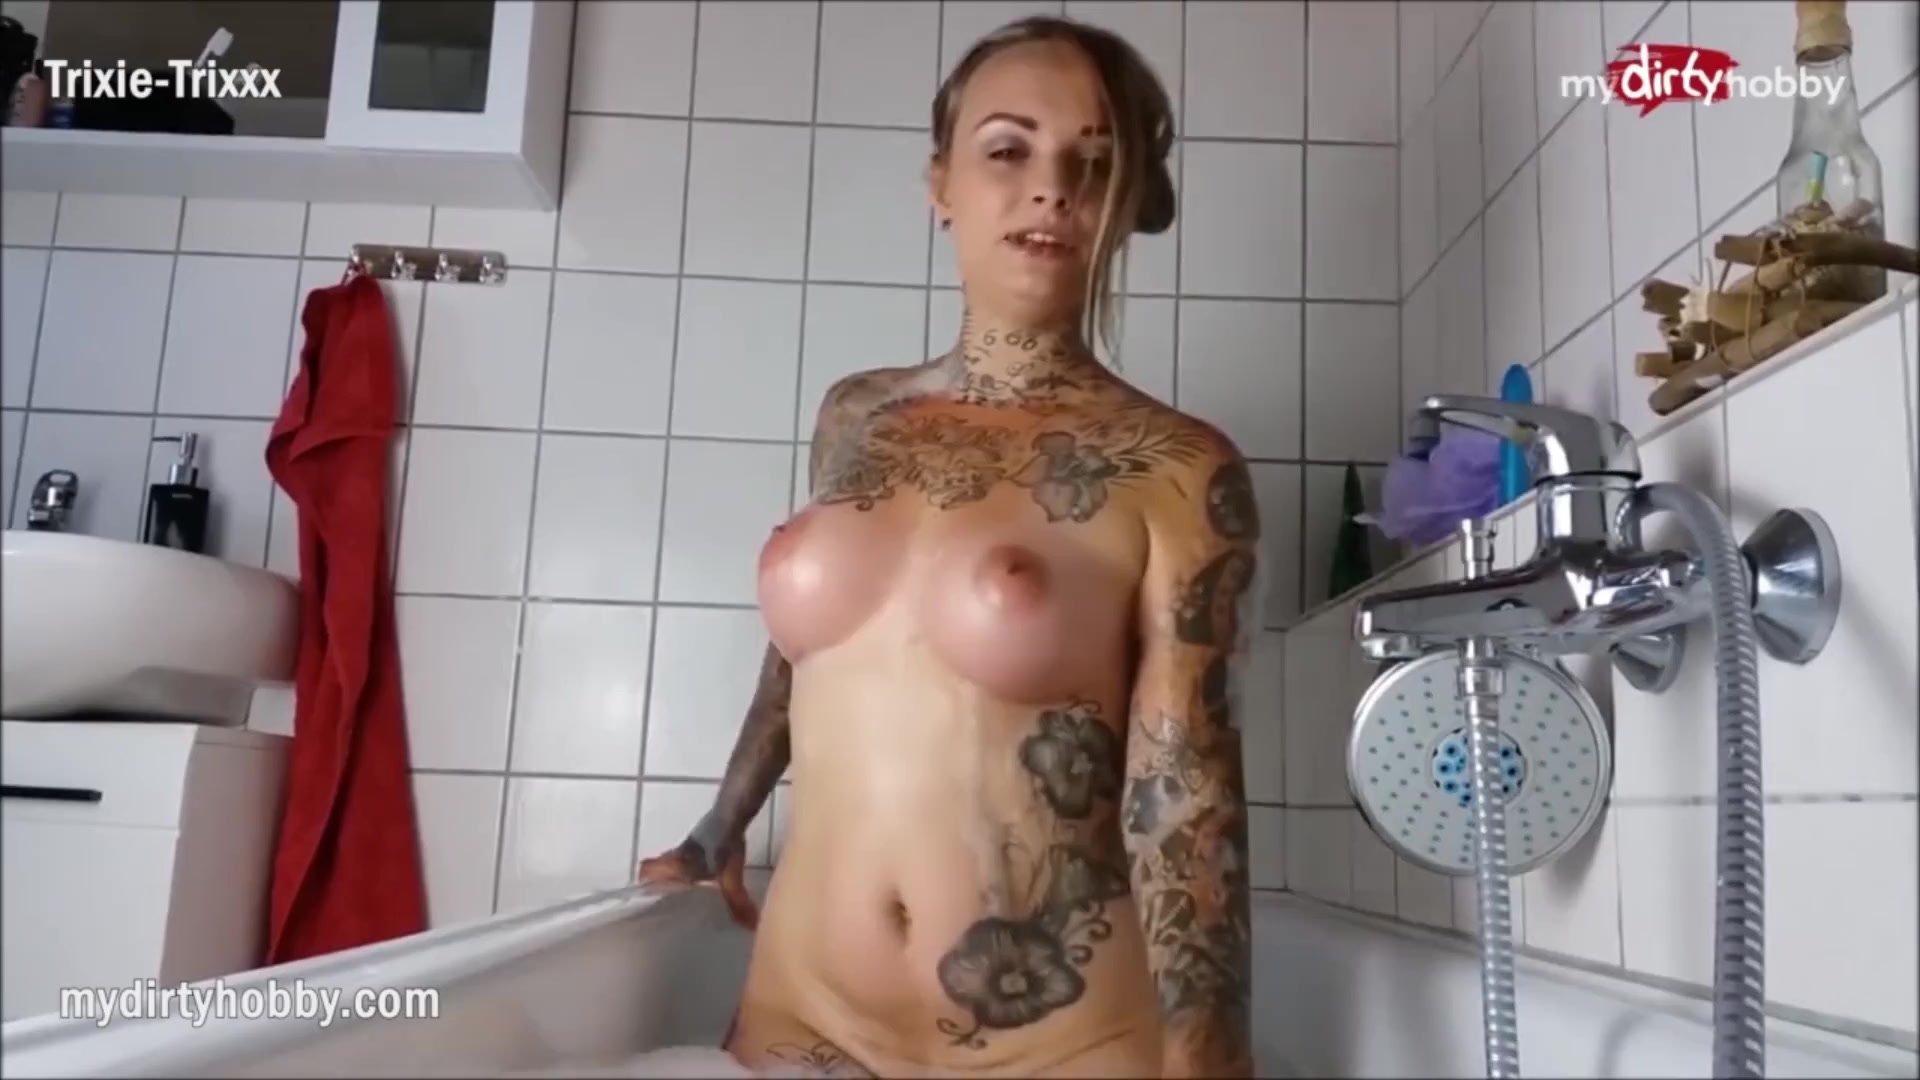 MyDirtyHobby - Tattooed babe masturbates in the bathtub